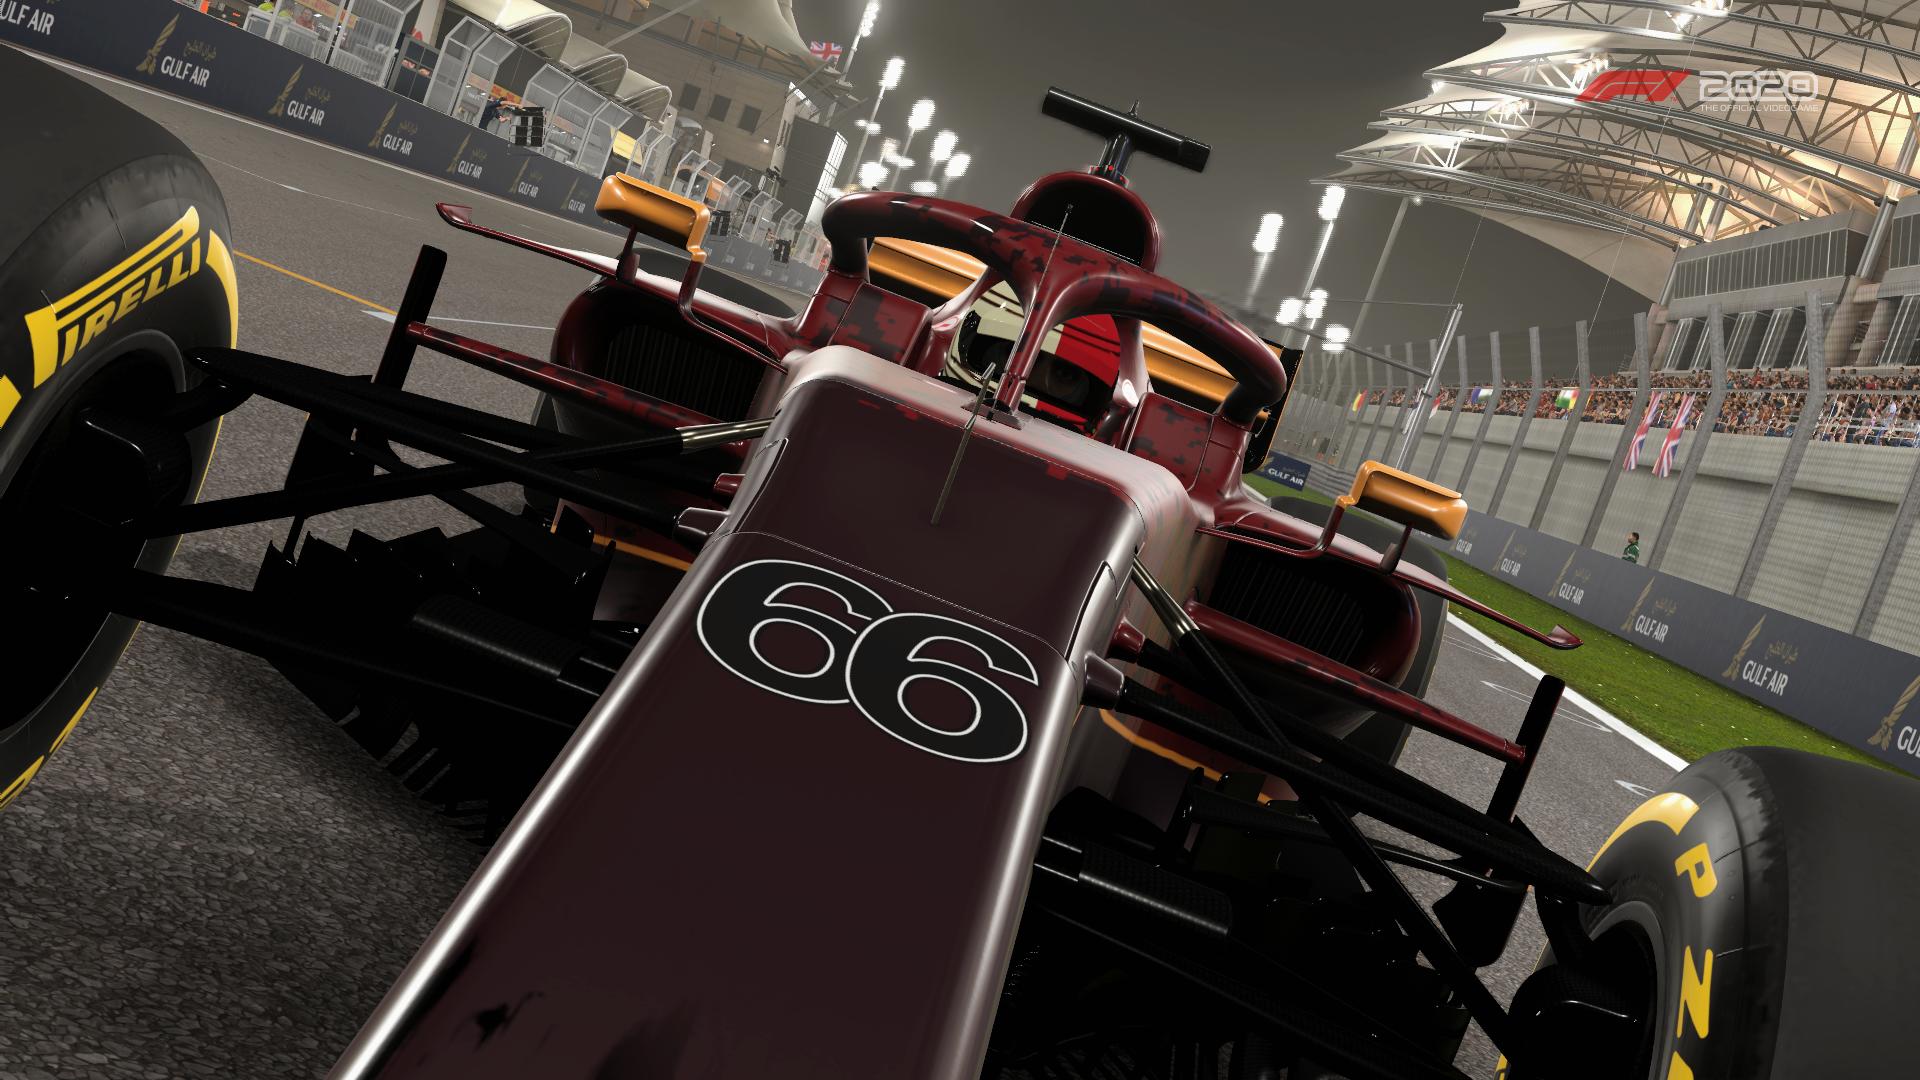 tilt-frame shot of a Formula 1 car racing into the foreground at Bahrain International Circuit, Sakhir